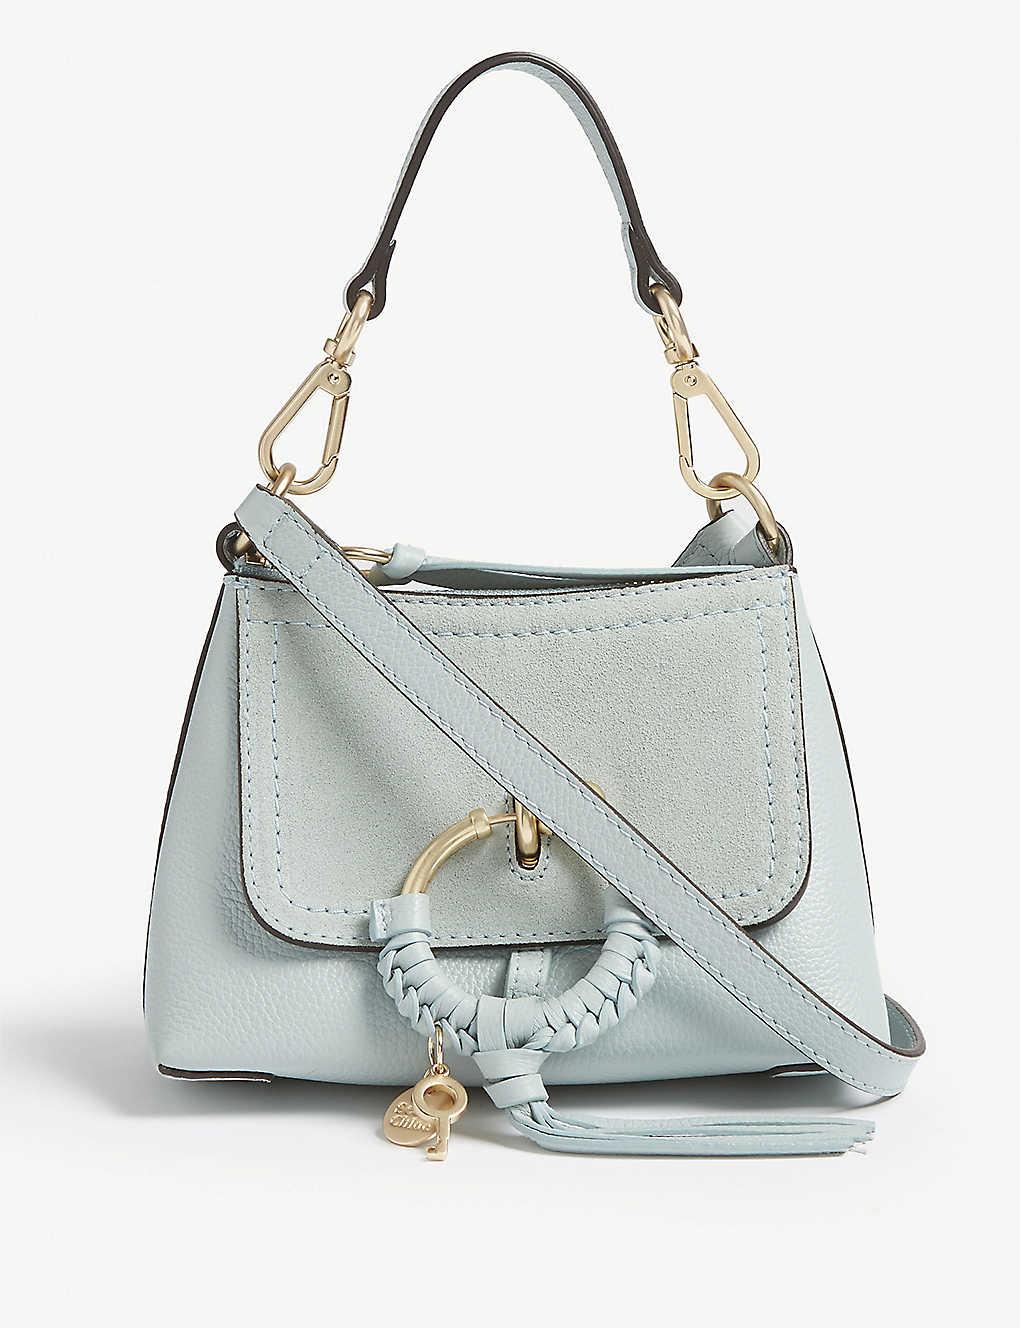 d87a70527 SEE BY CHLOE - Mini Joan cross-body bag | Selfridges.com